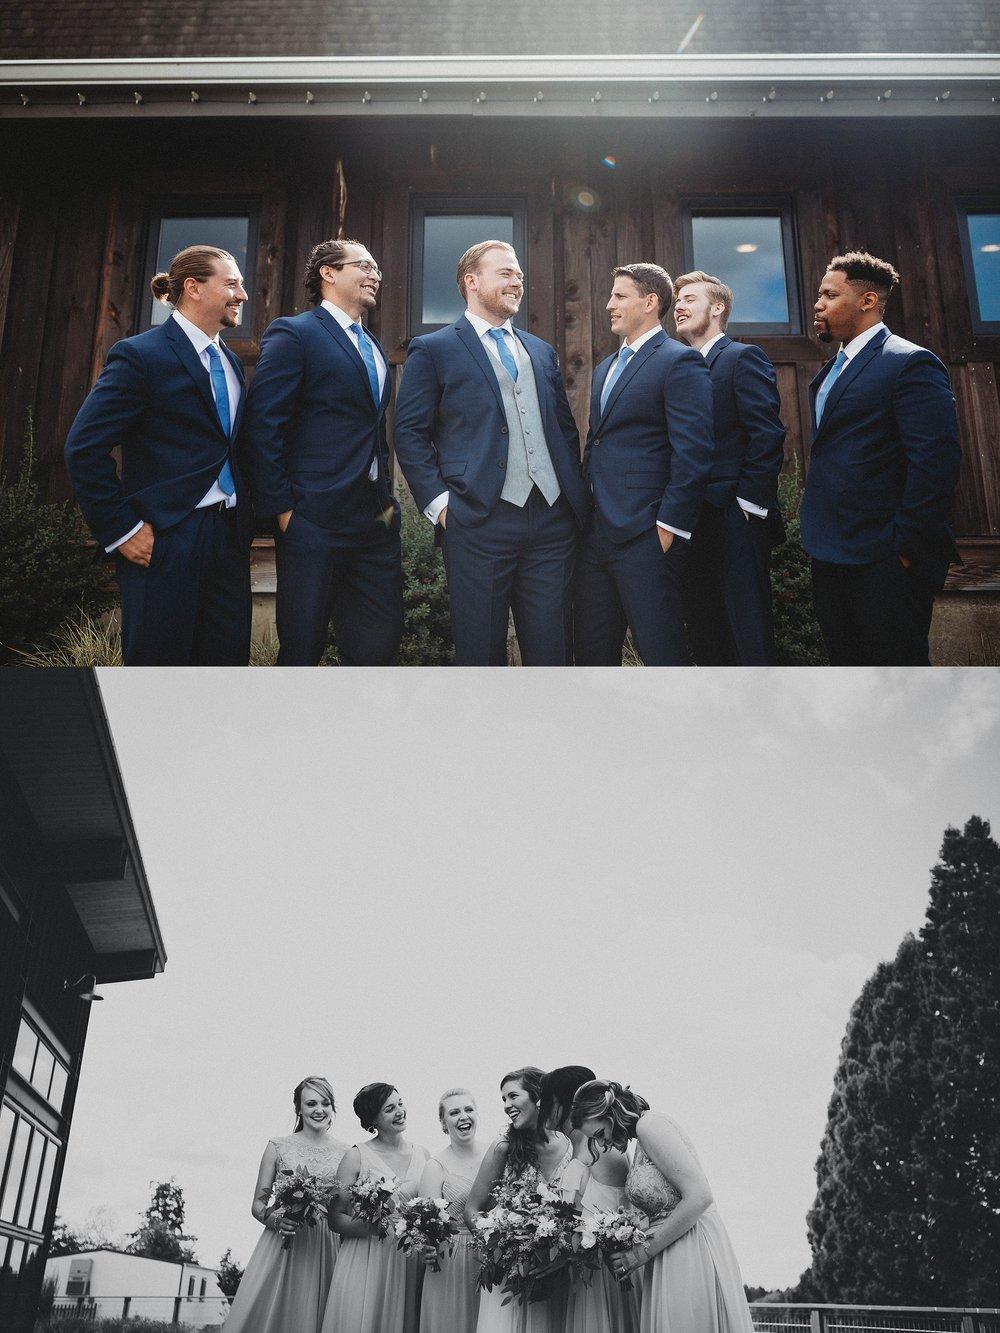 olson mansion wedding photography - jill and garrett - ashley vos photography - seattle area wedding photographer-26.jpg